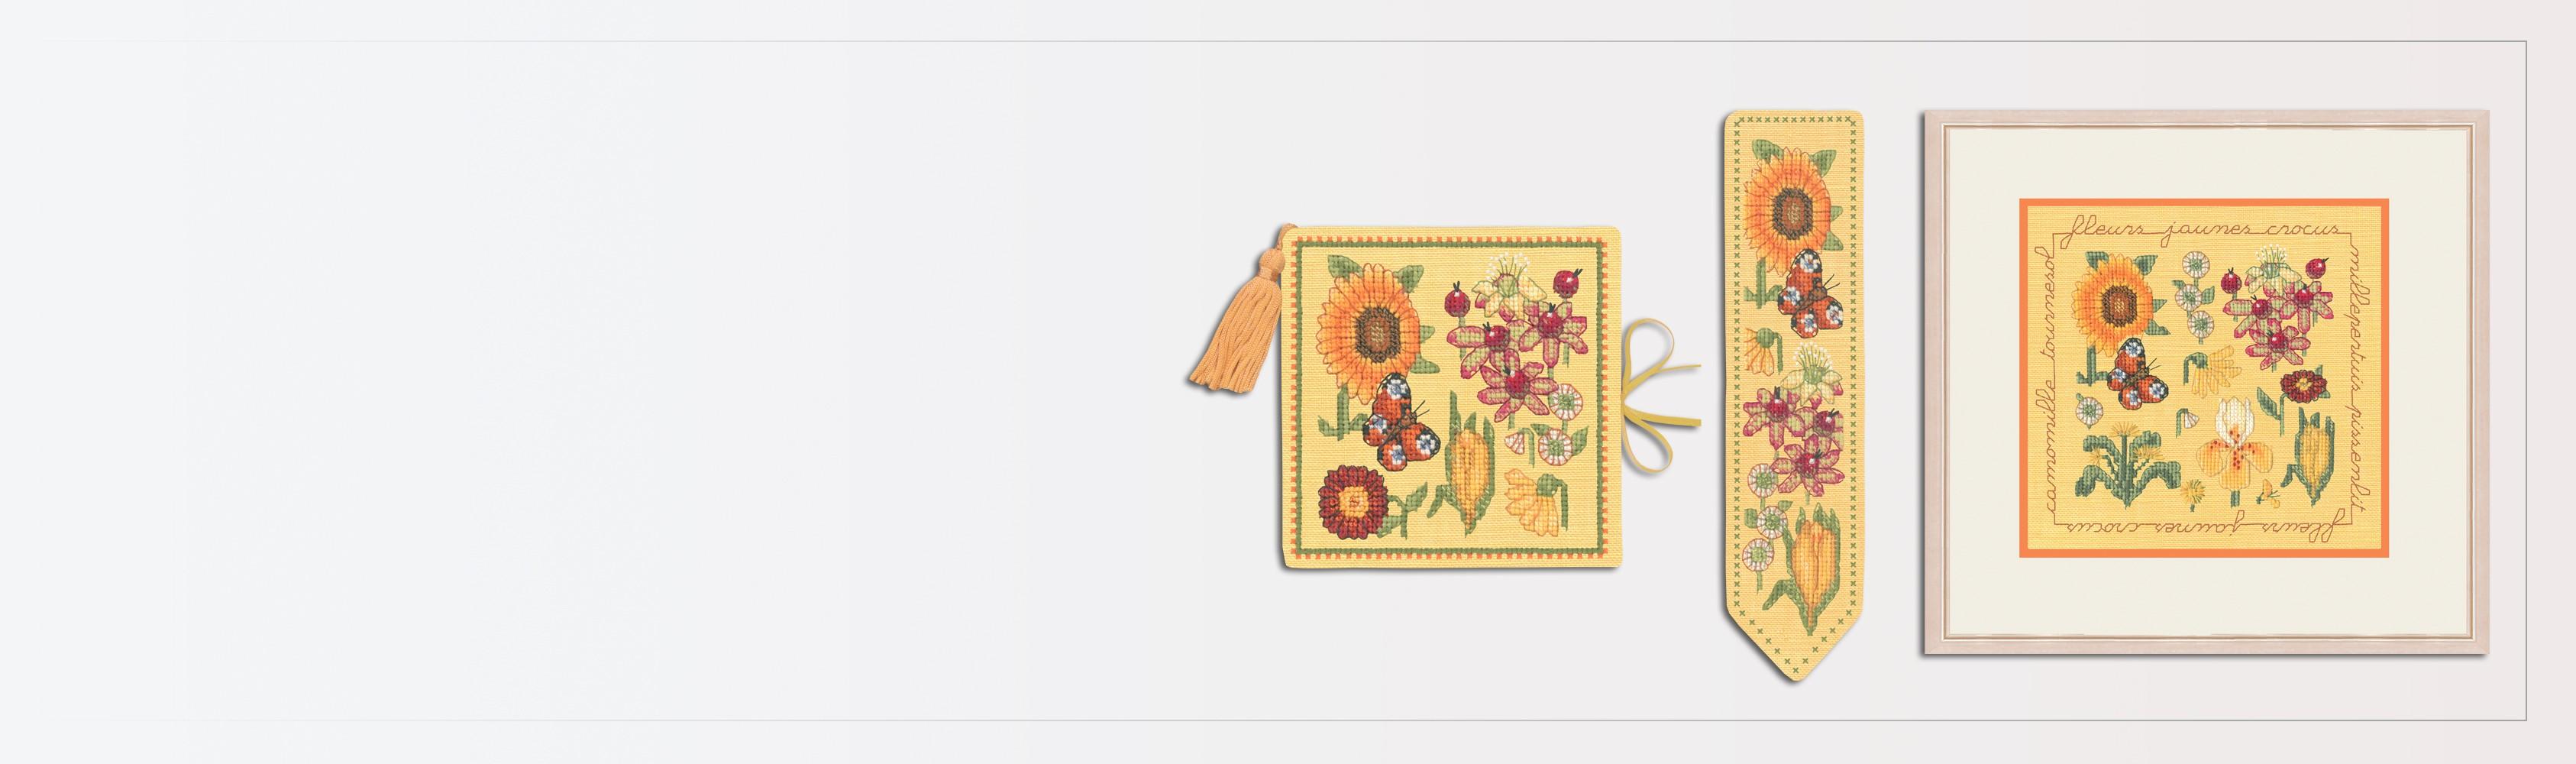 Counted cross stitch kit - Yellow flowers - the autumn trio. Needle case, bookmark, miniature picture. Le Bonheur des Dames